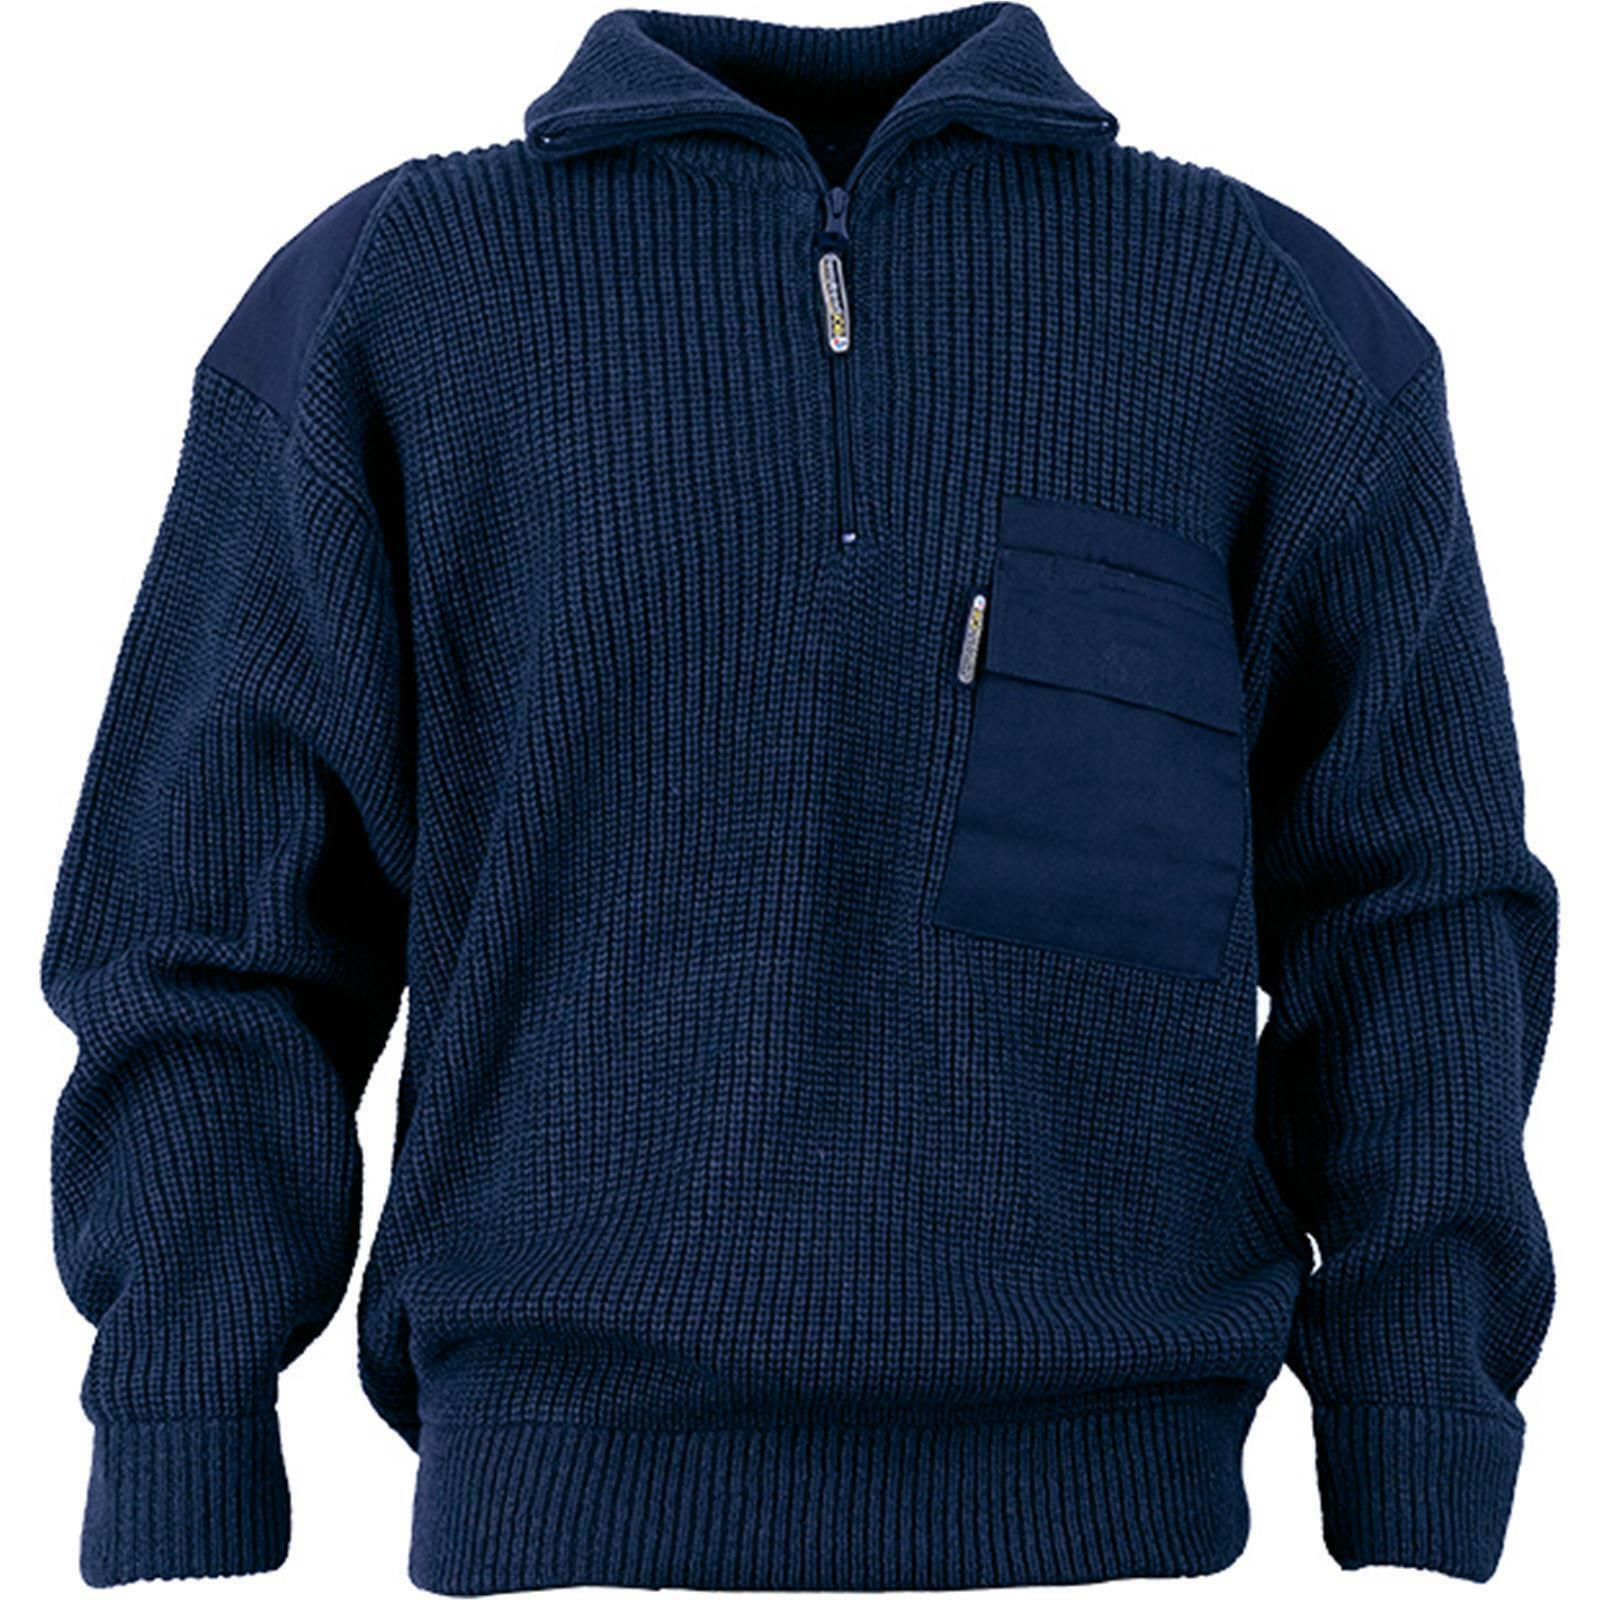 Troyer Pullover Pullover Pullover marine Gr. XL   Exquisite (in) Verarbeitung  976257